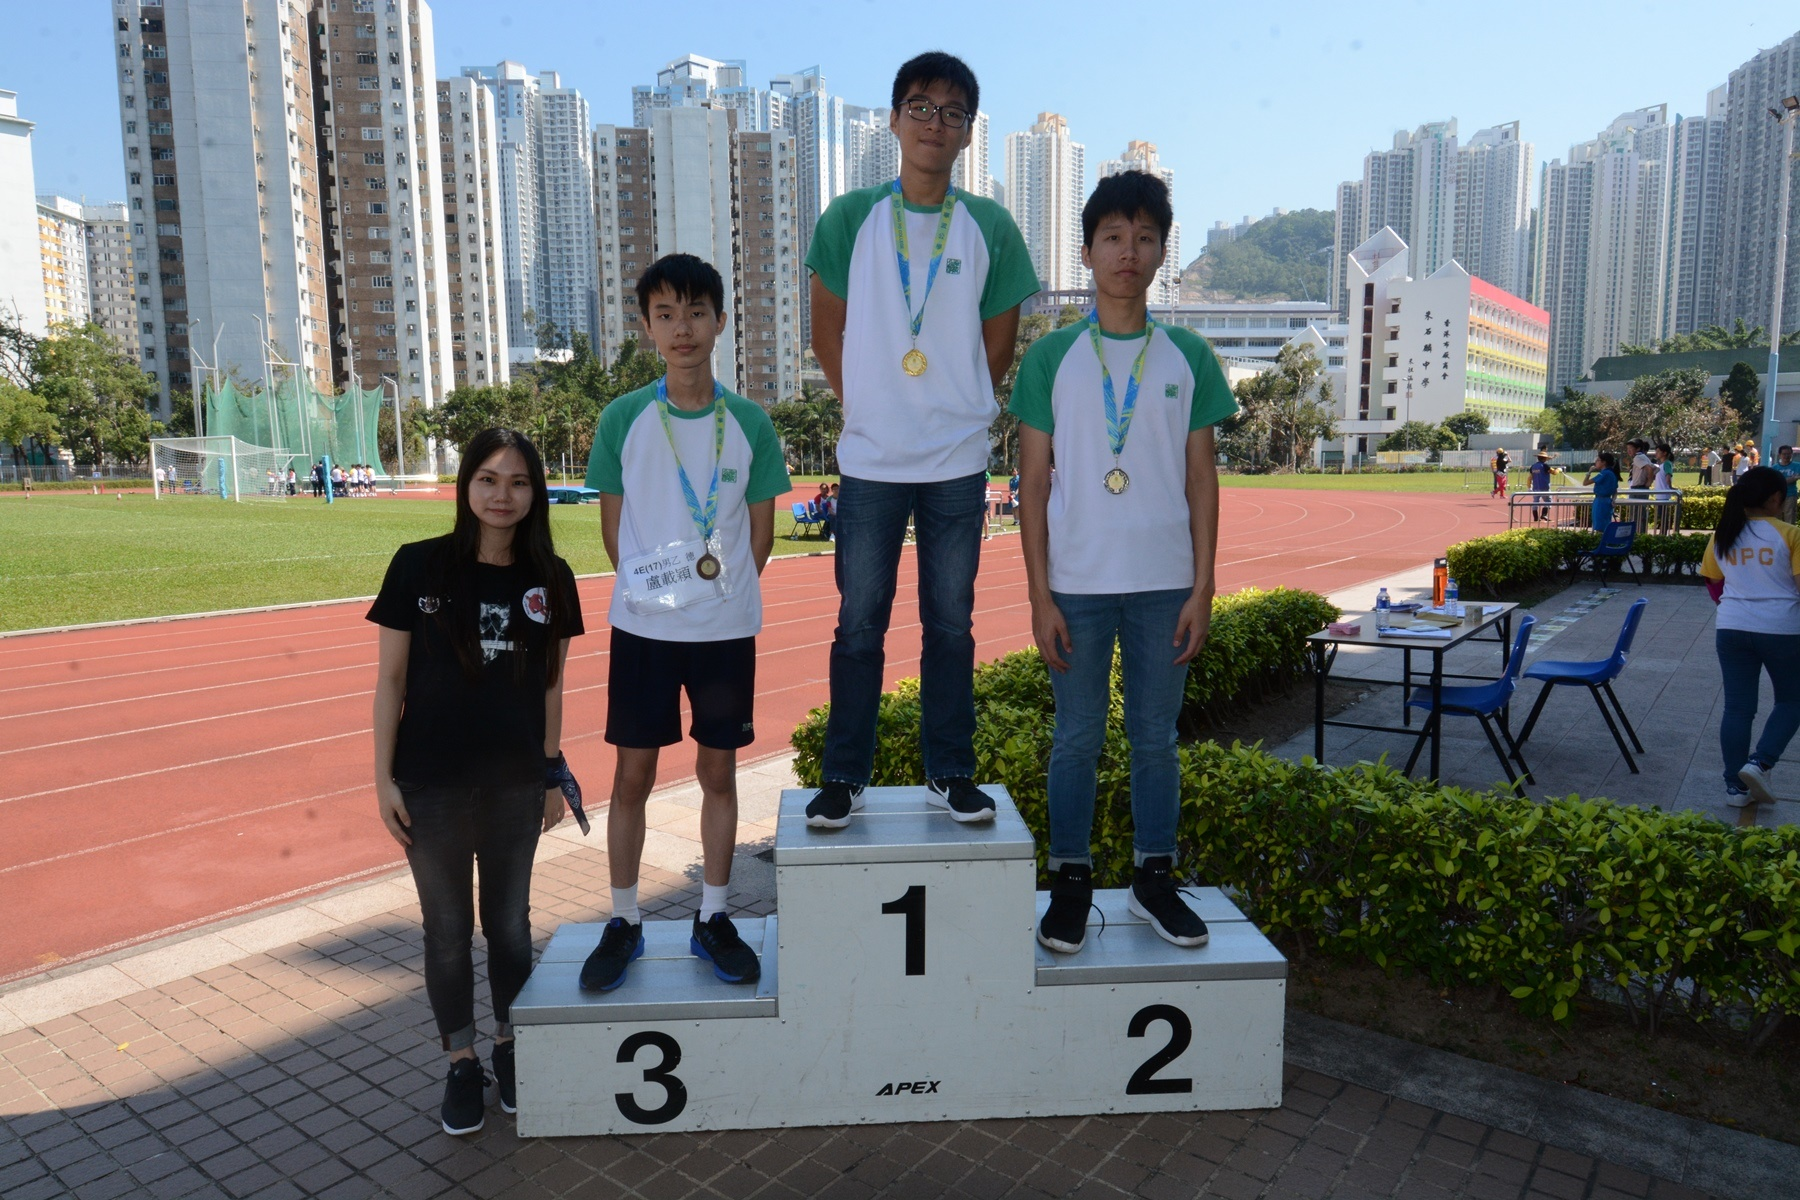 http://npc.edu.hk/sites/default/files/dsc_4120_1.jpg